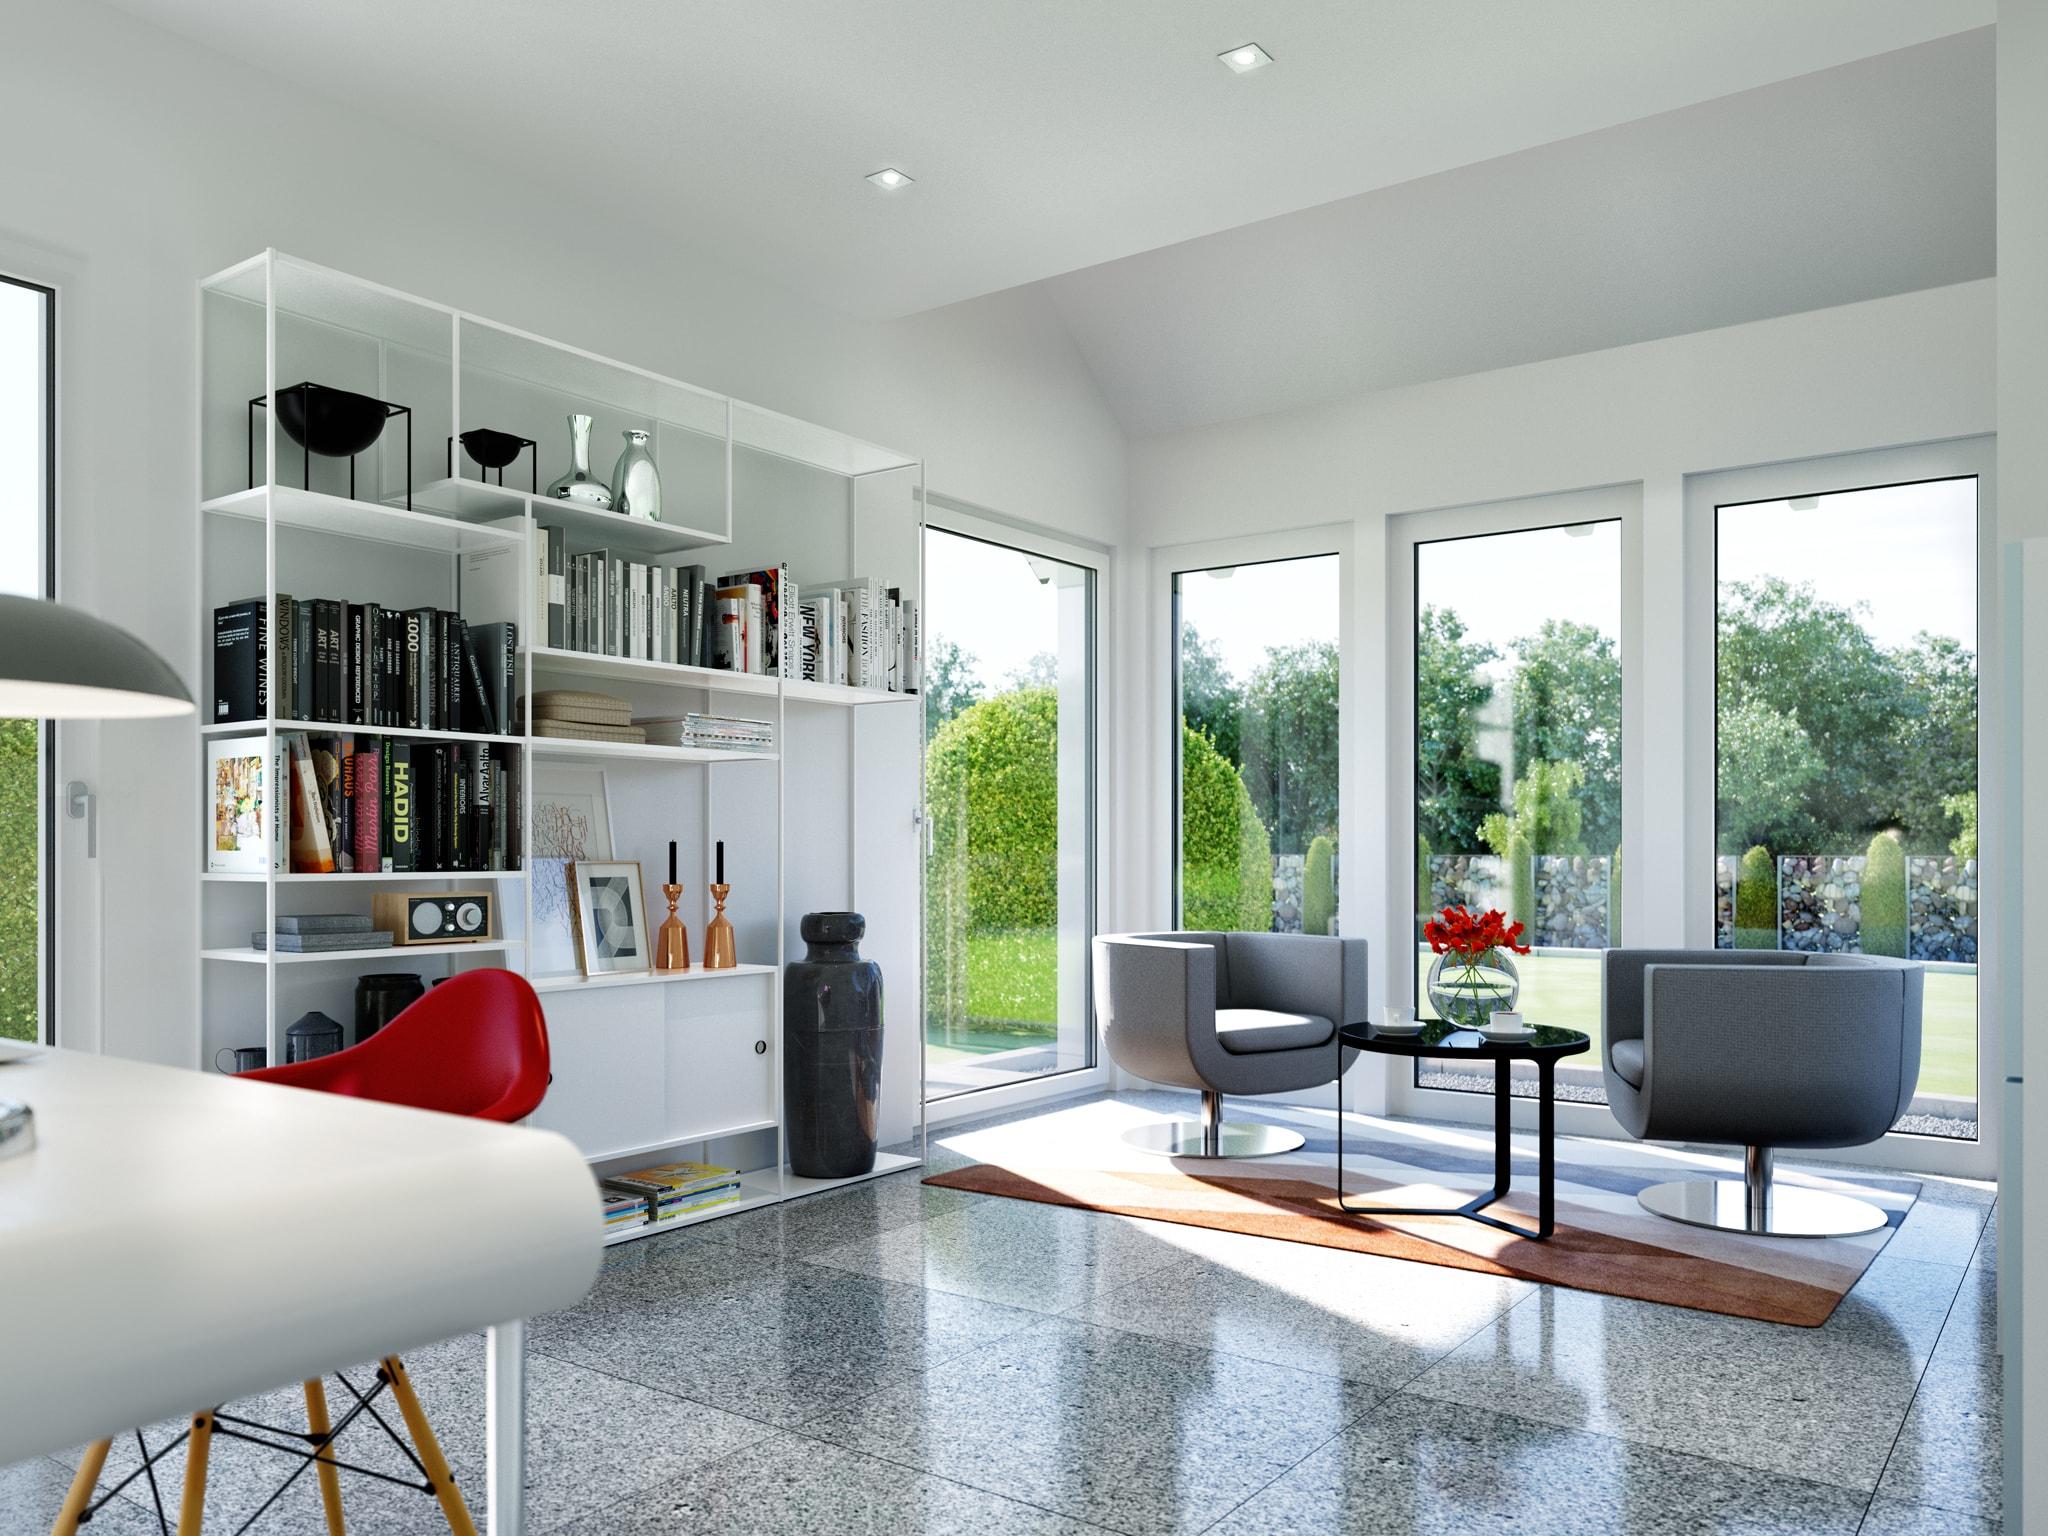 Arbeitszimmer - Einfamilienhaus Inneneinrichtung Ideen modern Living Haus Fertighaus SUNSHINE 143 V5 - HausbauDirekt.de